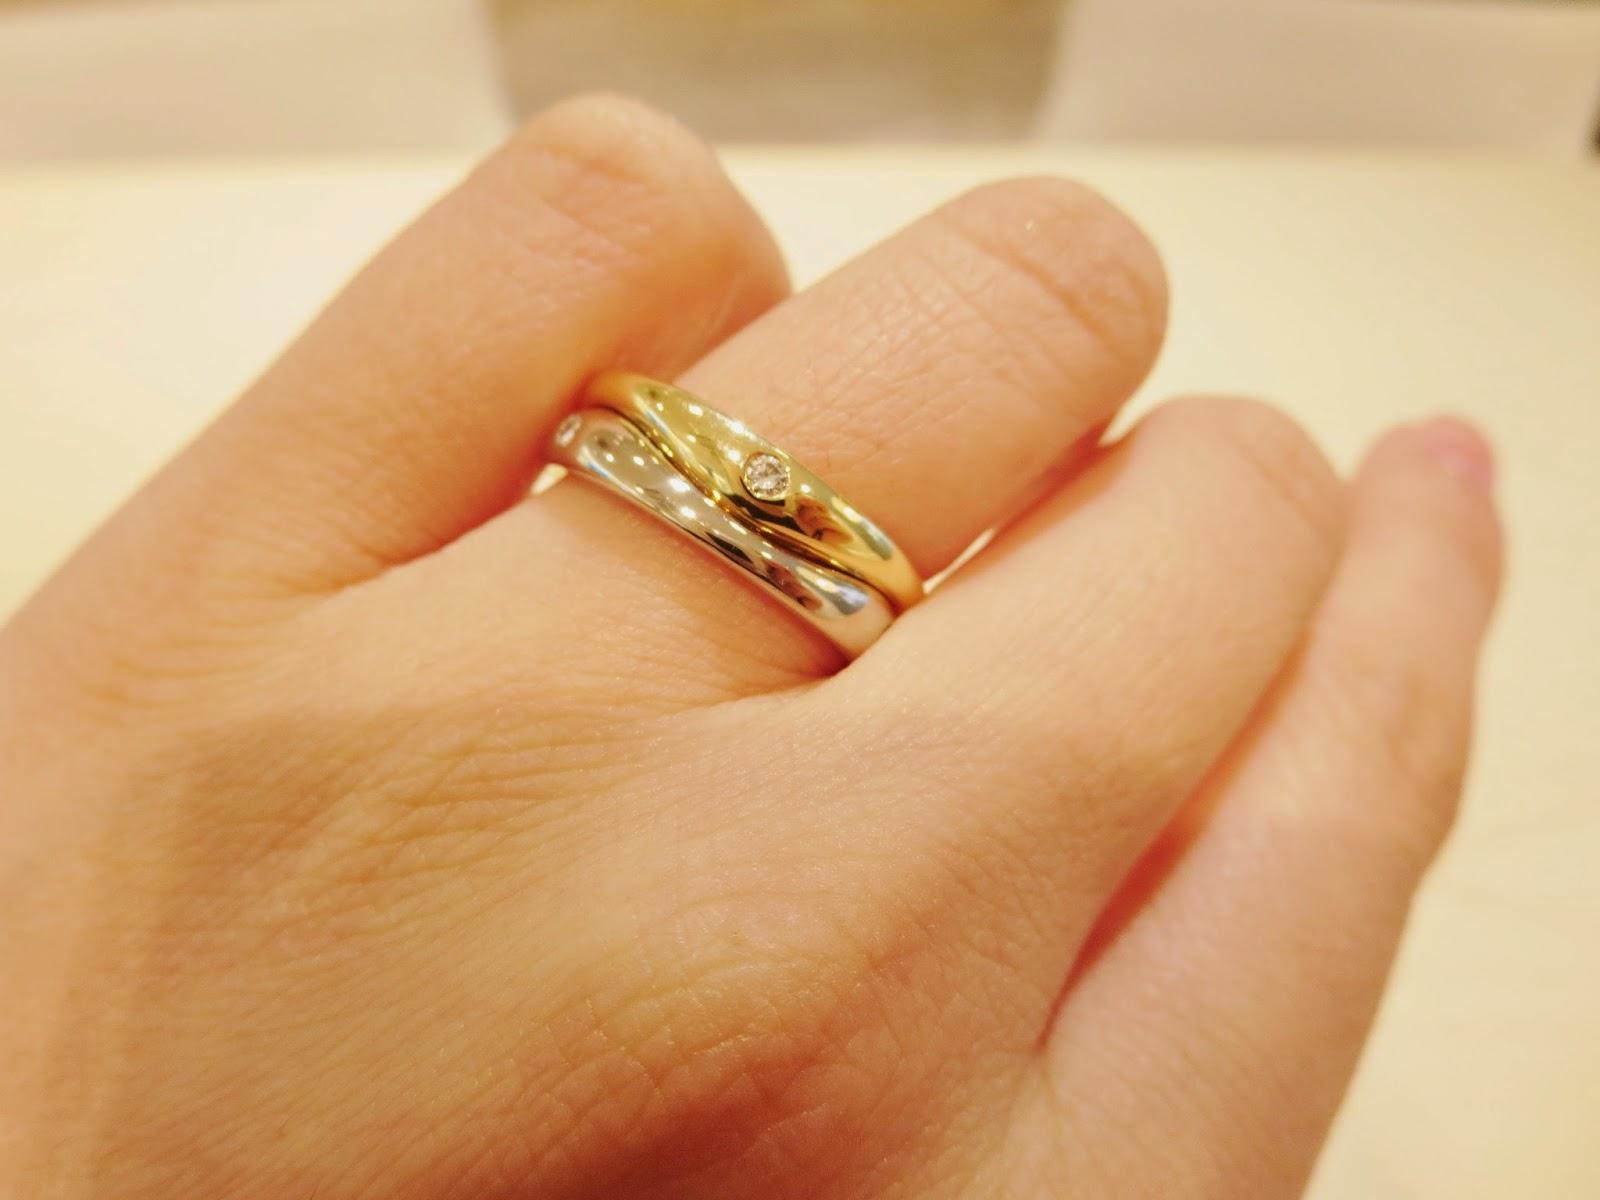 FURRER JACOT フラー・ジャコー 名古屋 結婚指輪 太め ゴールド 鍛造 クオリティ